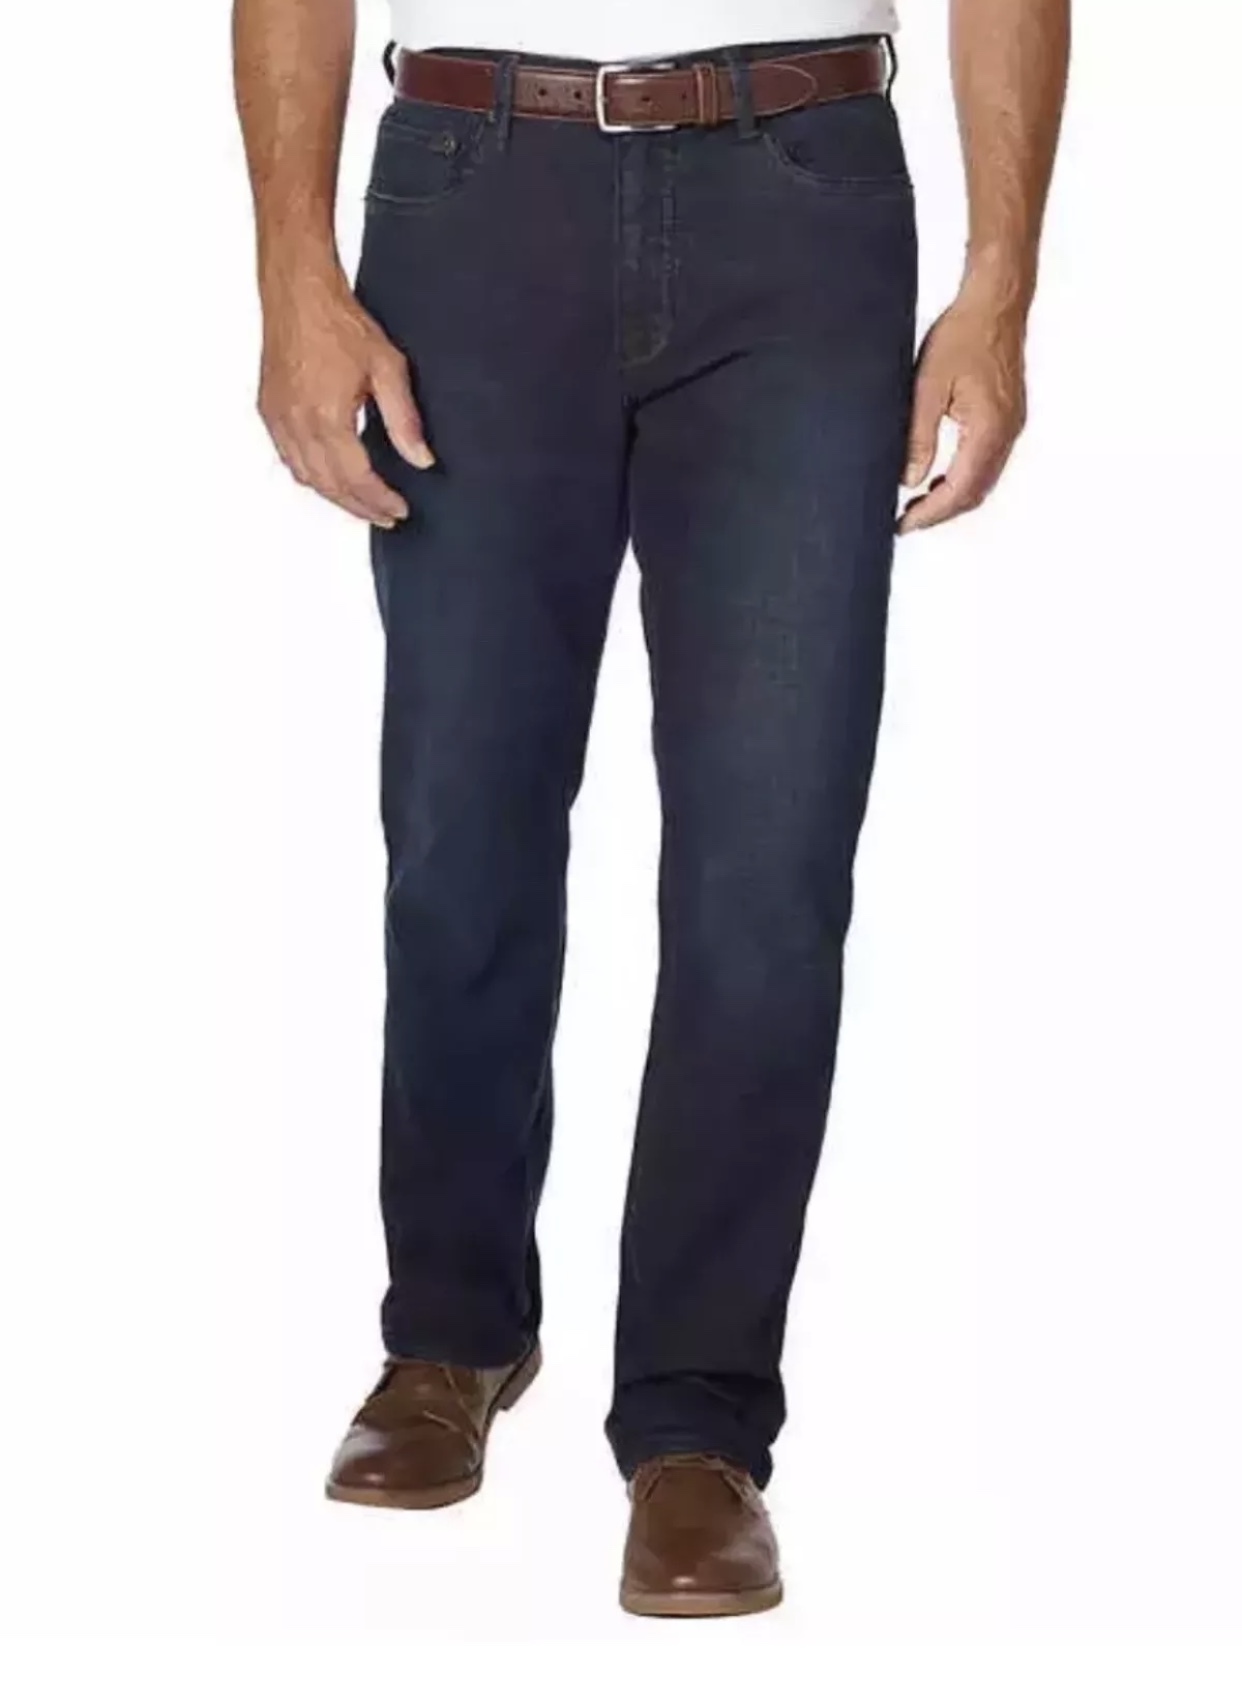 1777db93 Mens Urban Star Quality Denim Jeans. Black or Blue. $14.99. New with tags